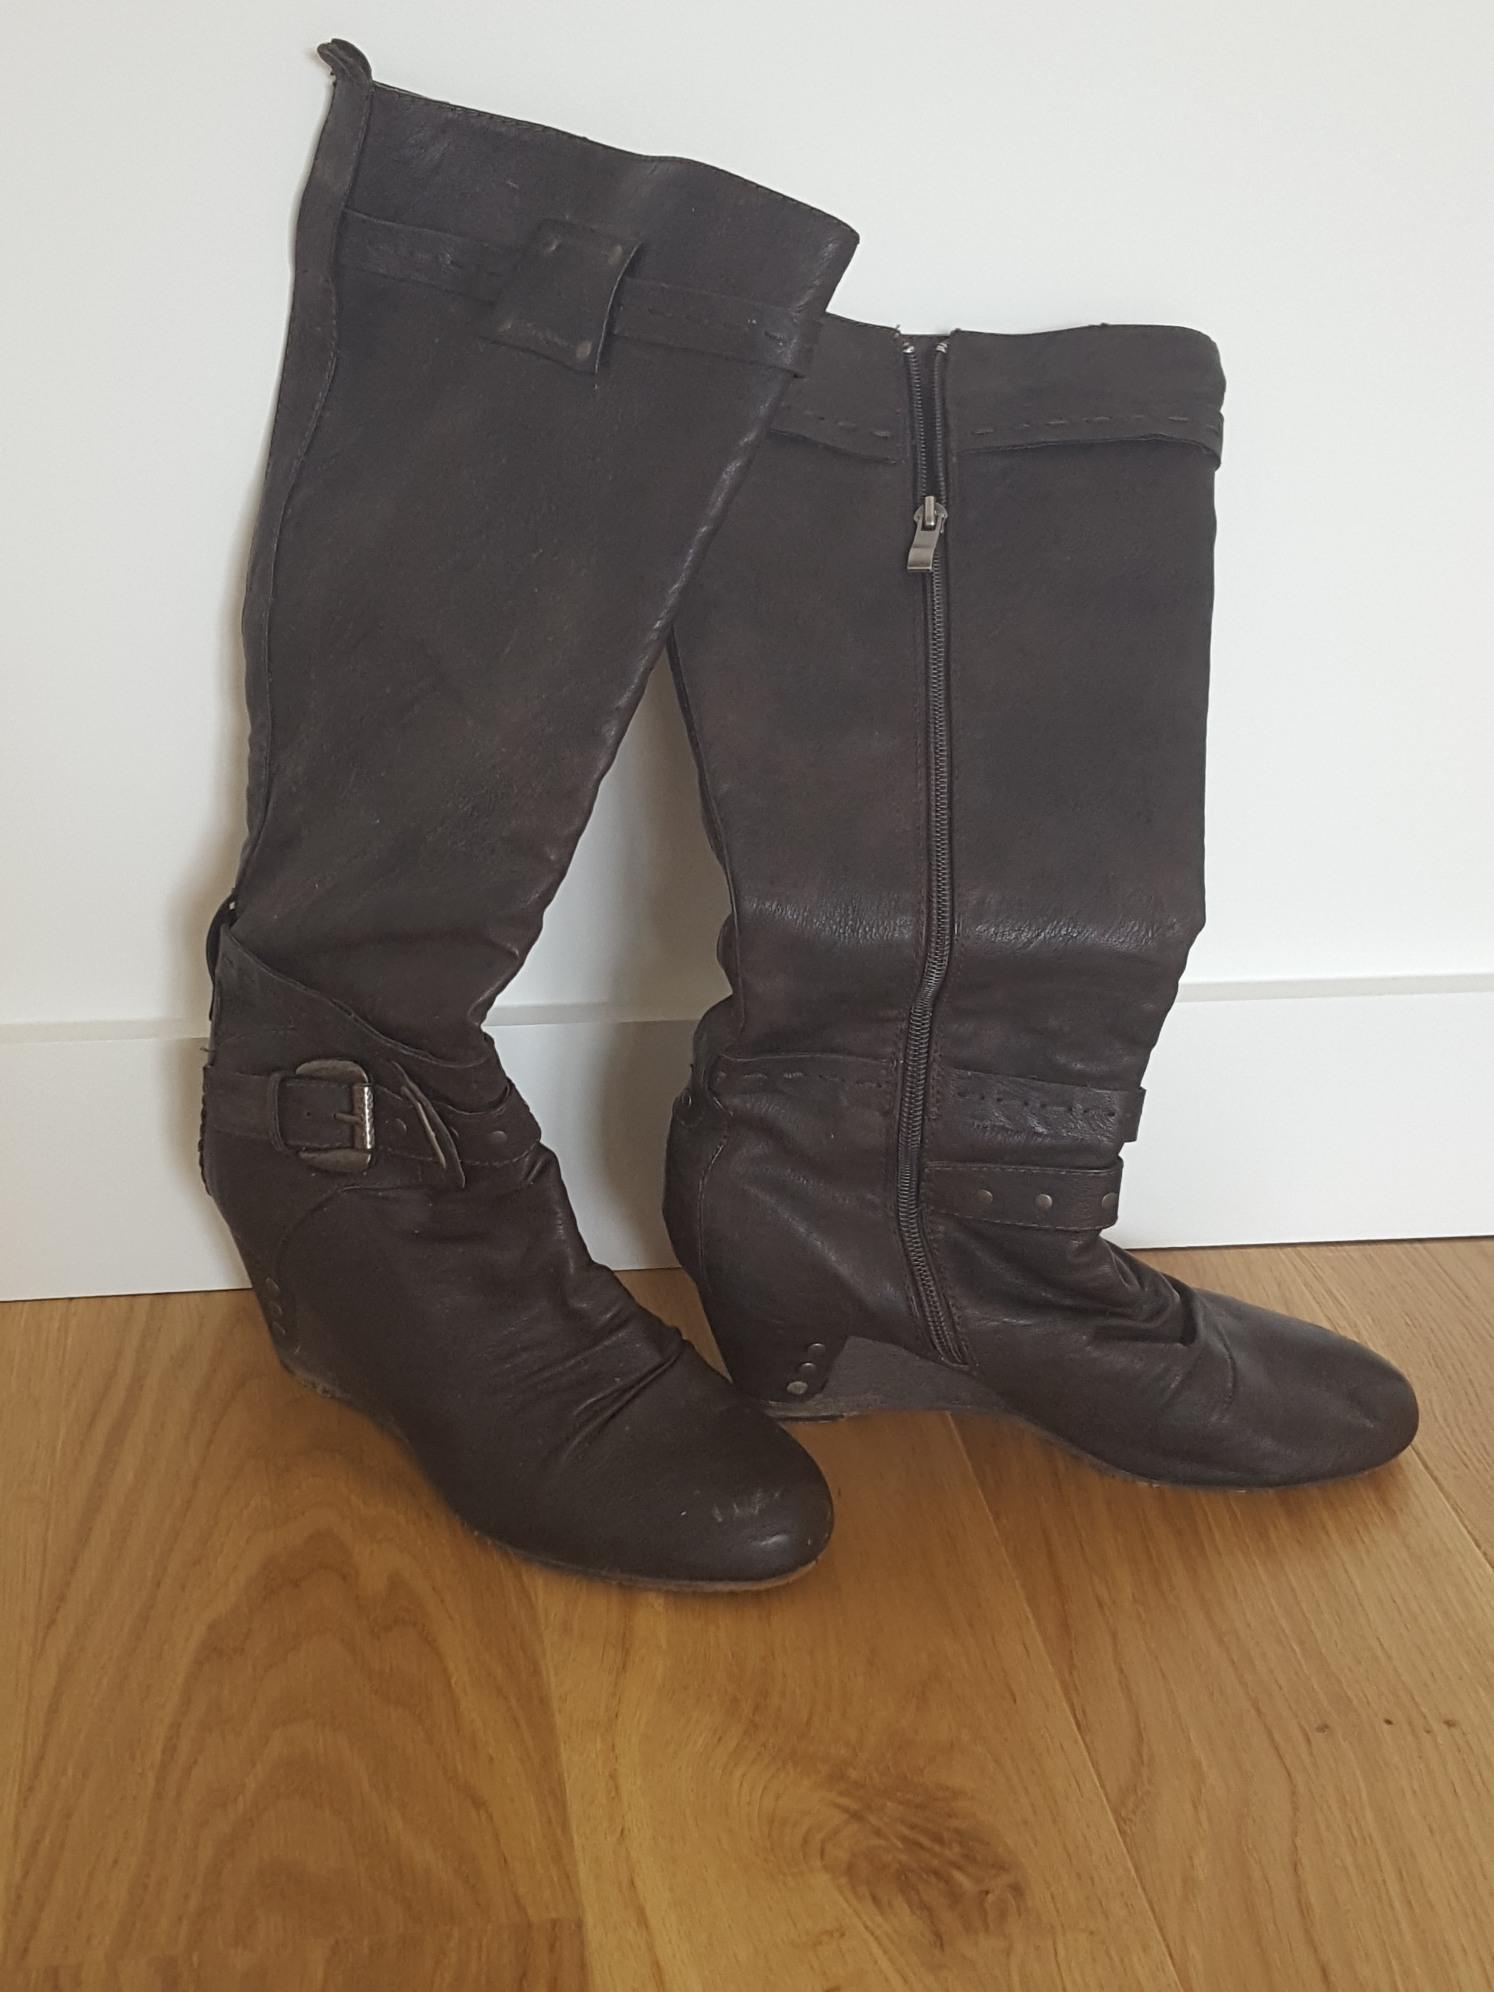 Achetez bottes bottes quasi quasi neuf, annonce vente à Anthon (38 ... c63386723426